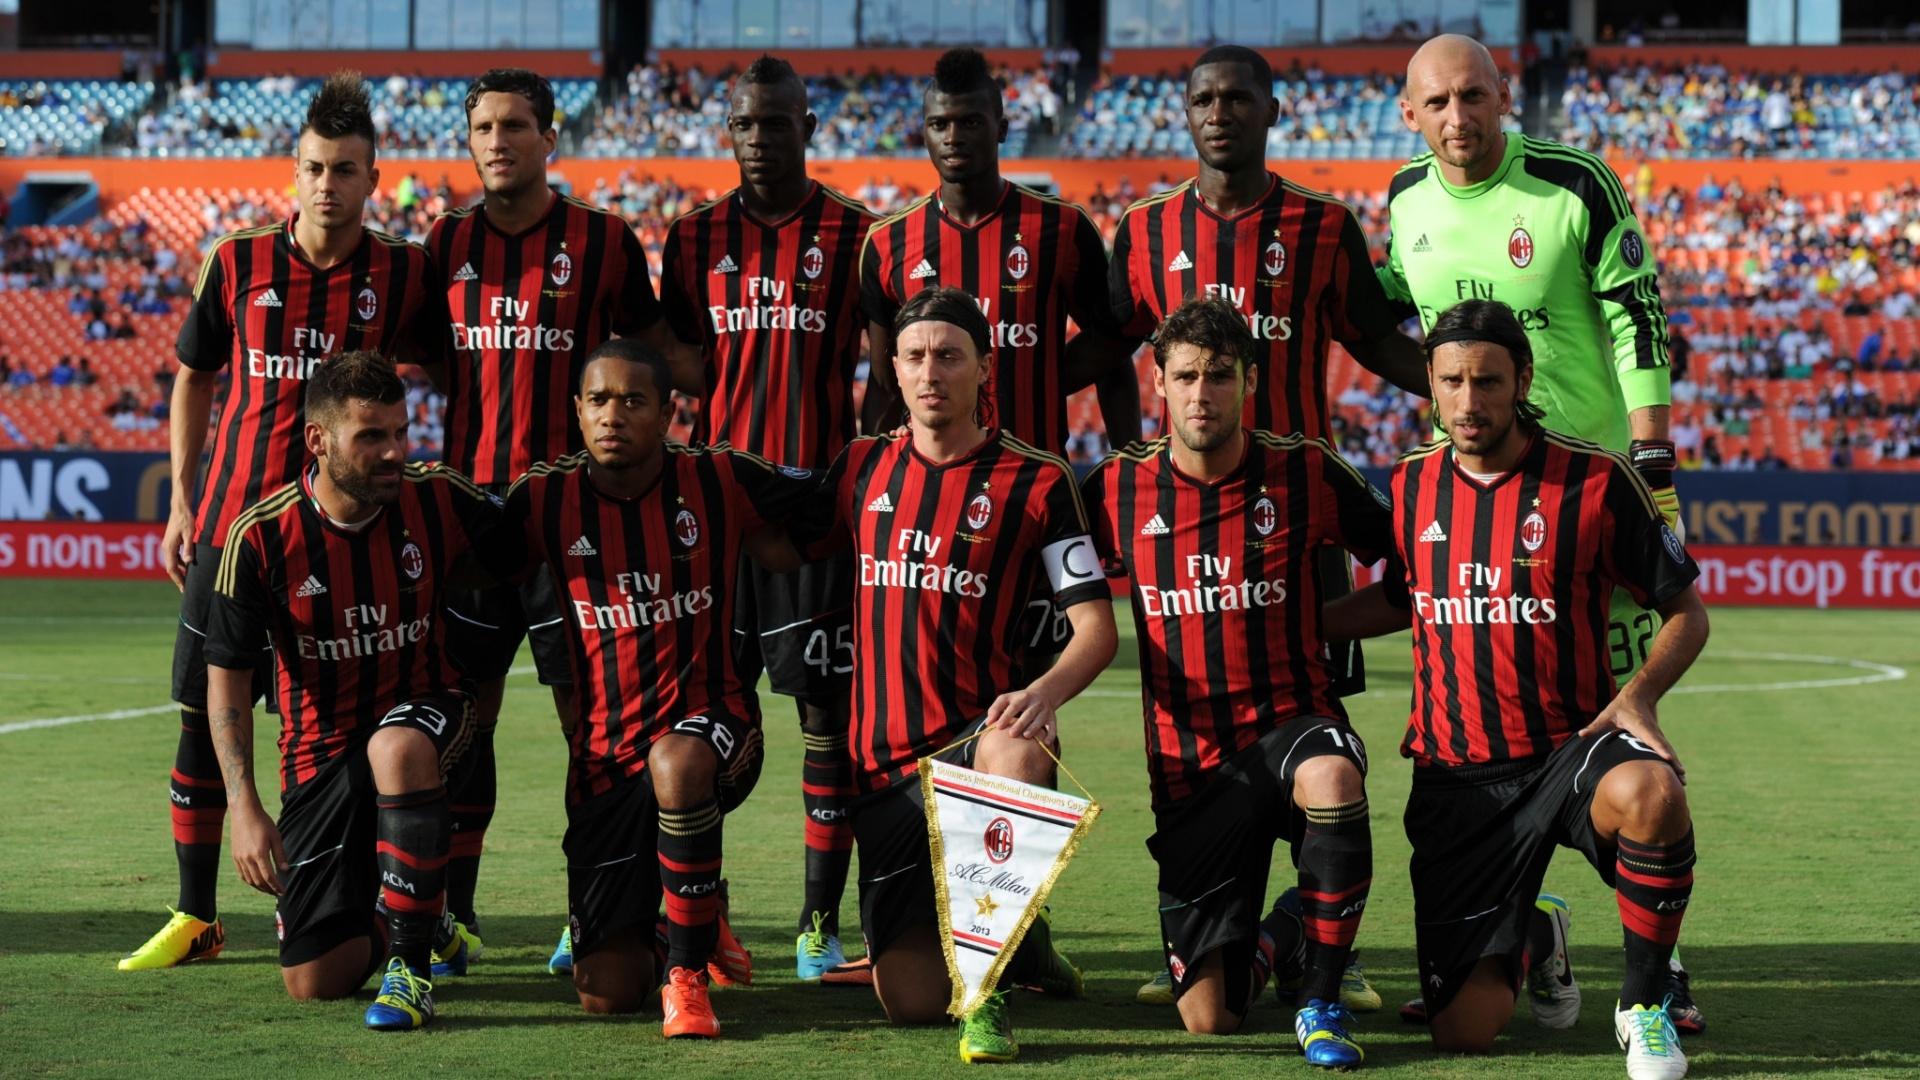 07-08-2013 - Time do Milan enfrentou o L.A. Galaxy na disputa do terceiro lugar da Guinness International Champions Cup